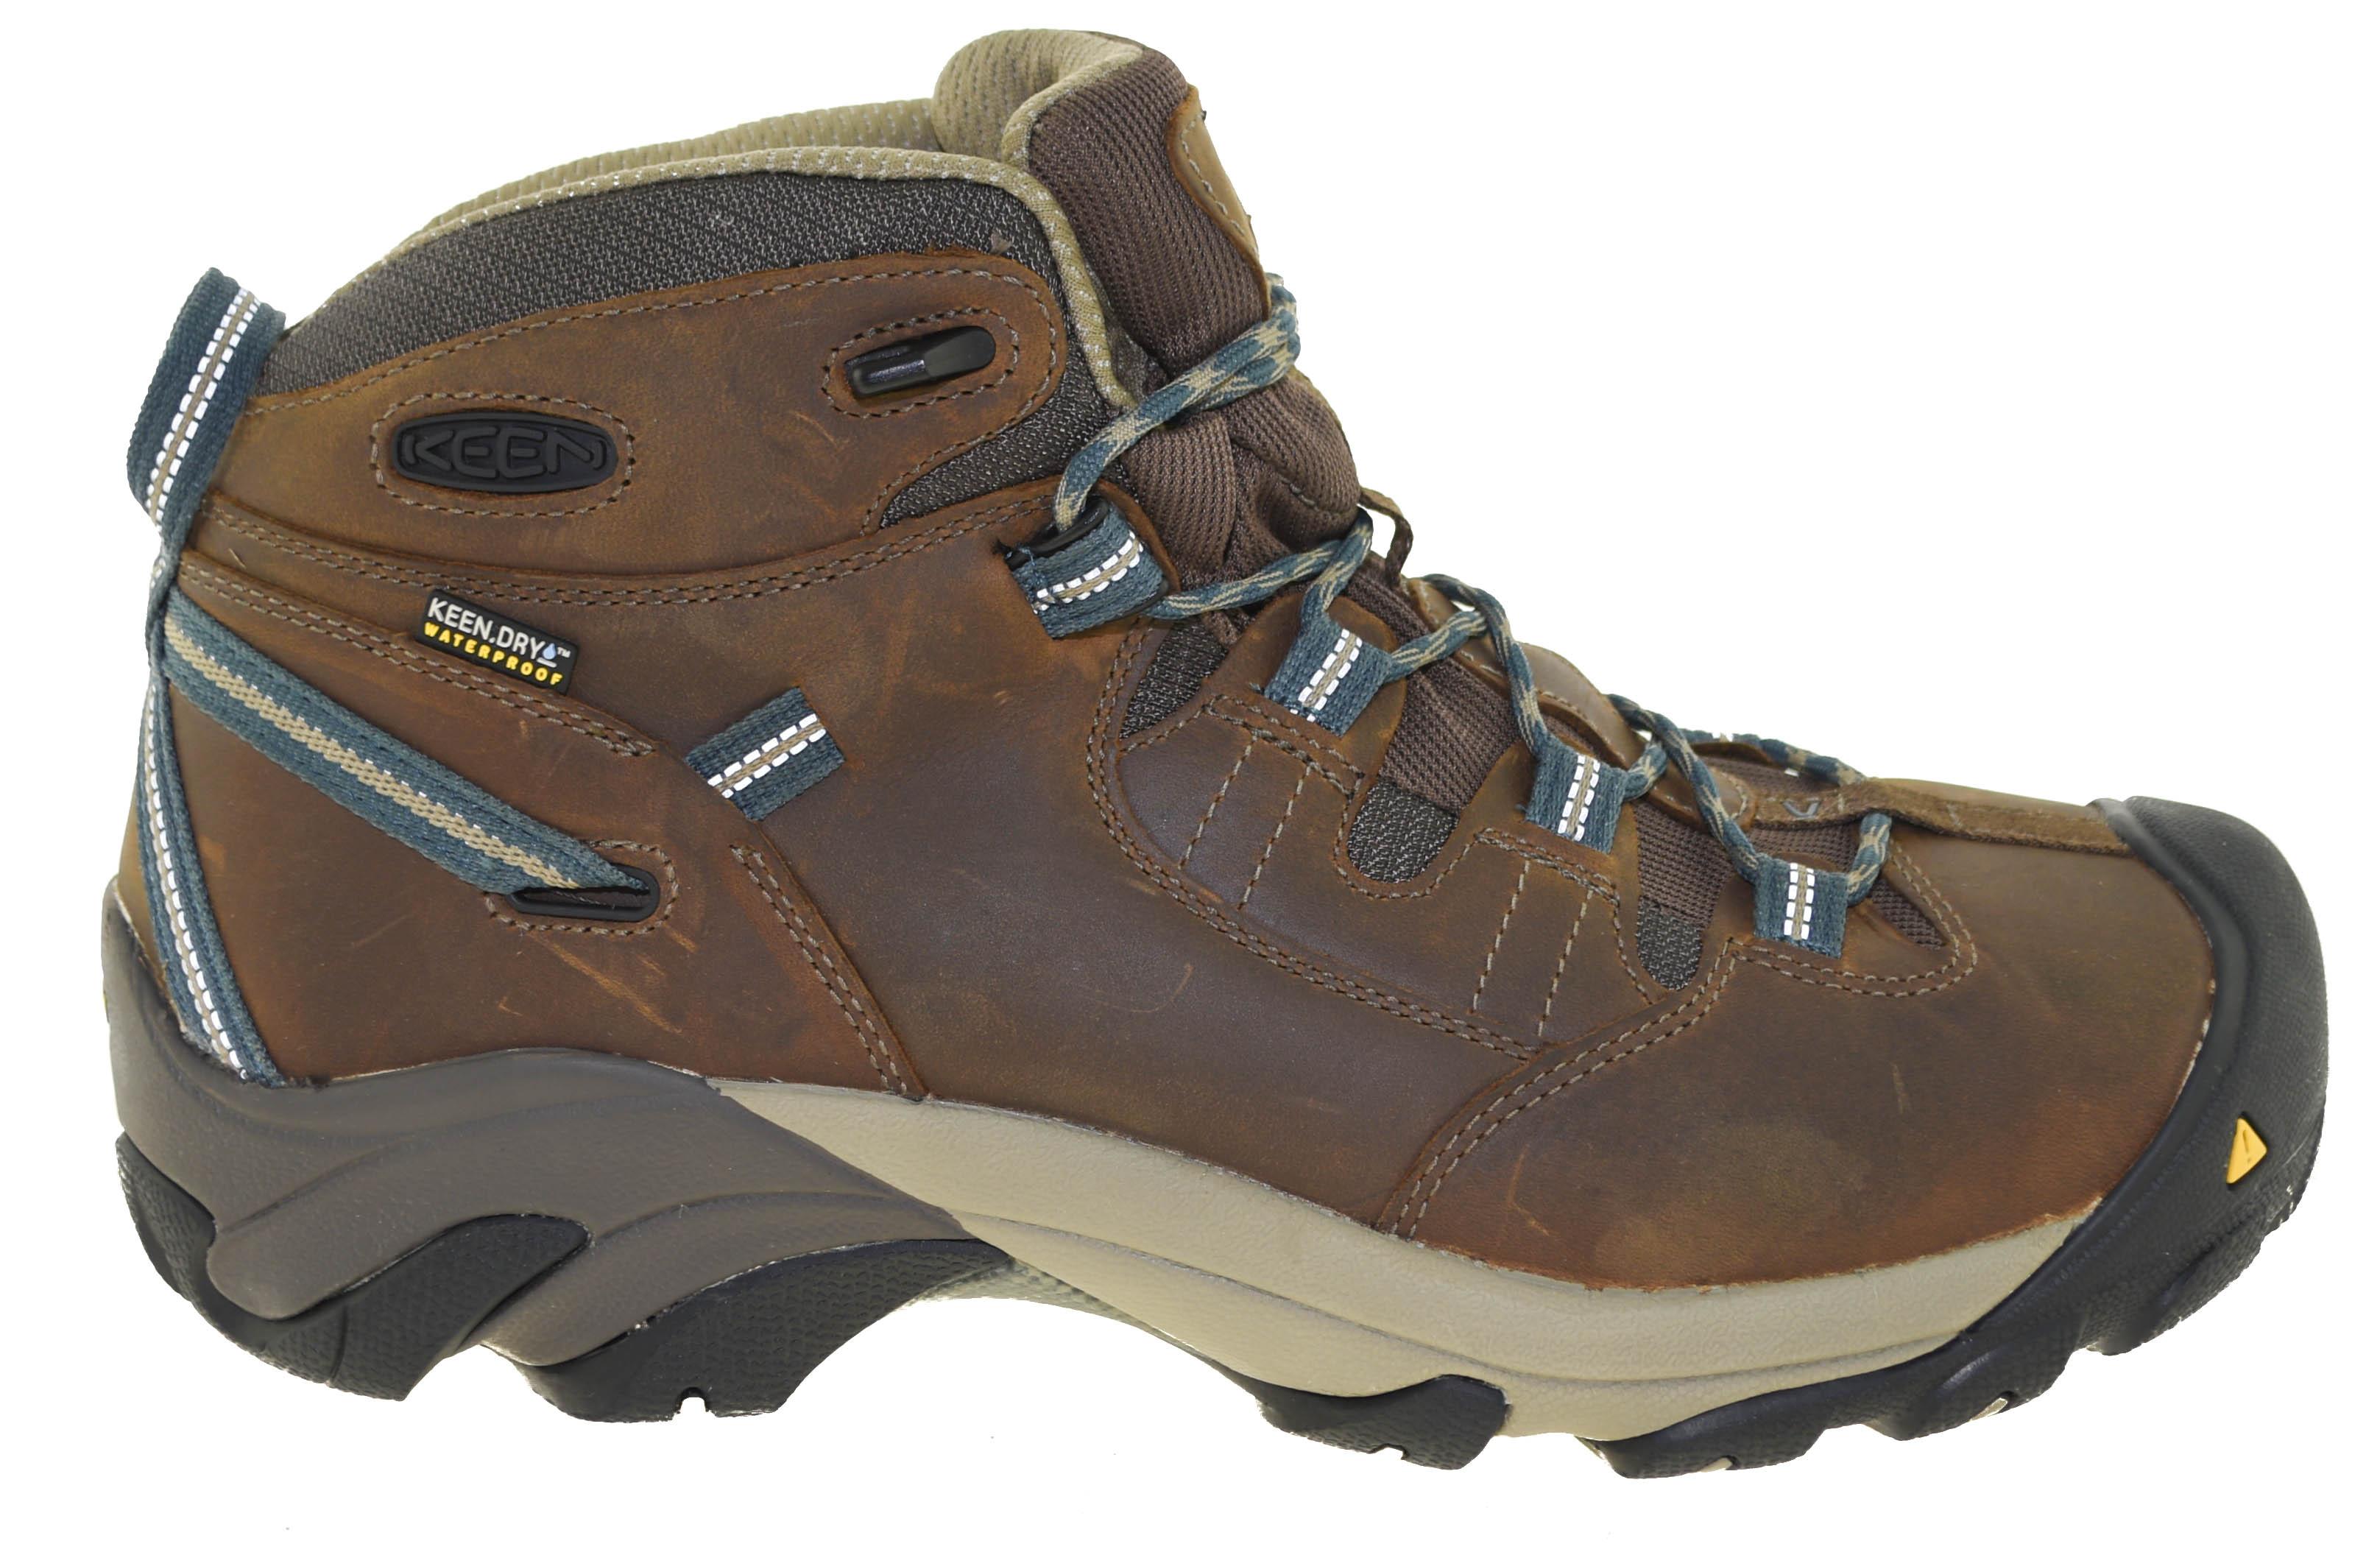 Keen Utility Men s Detroit Mid Steel Toe Work Boots Slate Black Style  10070034 8a84e148552